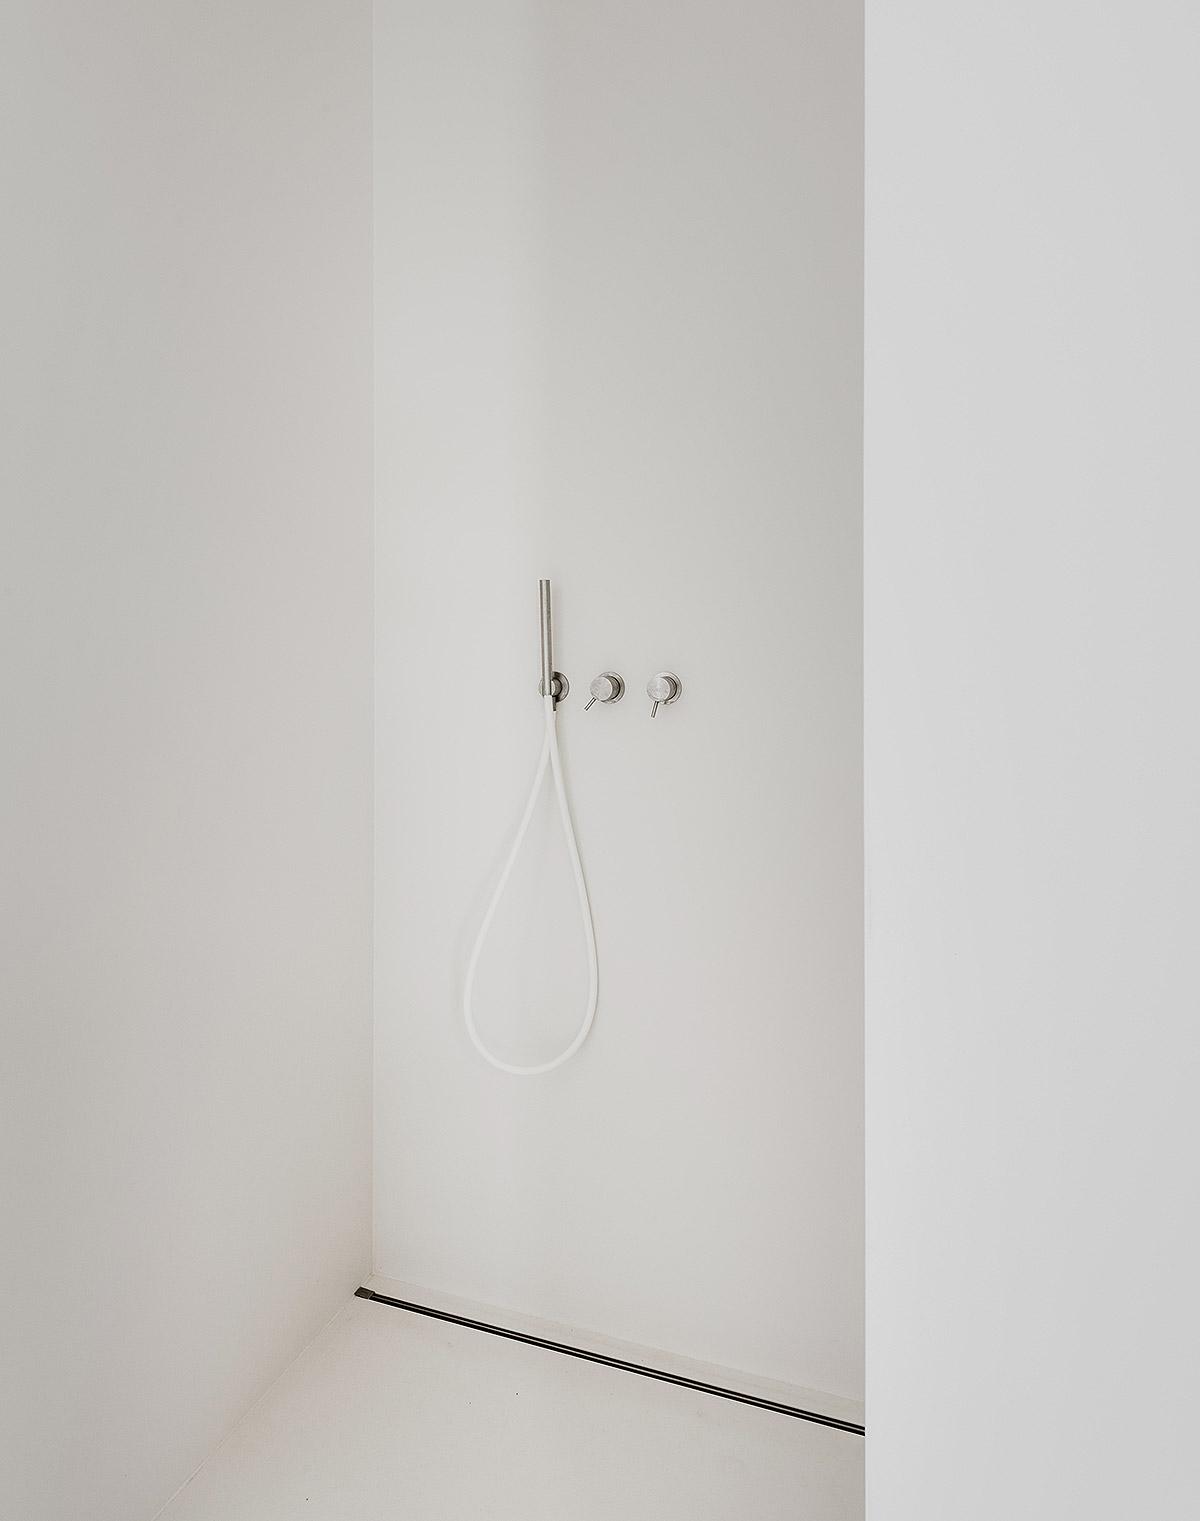 035_tamizo_architects_interior_house_realization_warsaw_poland_50